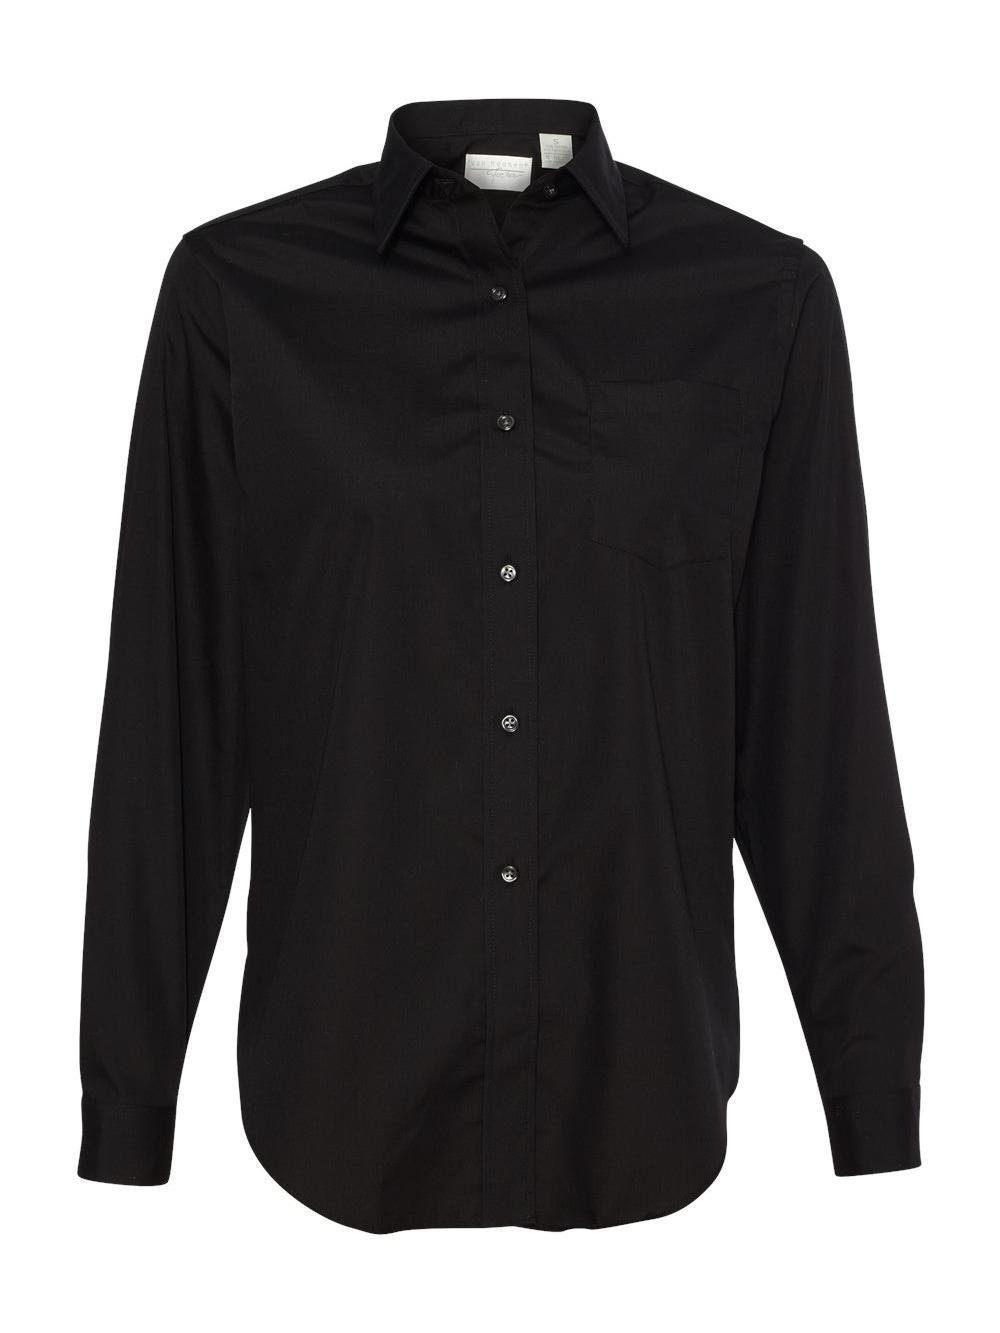 Van-Heusen-Women-039-s-Broadcloth-Long-Sleeve-Shirt-13V0216 thumbnail 3